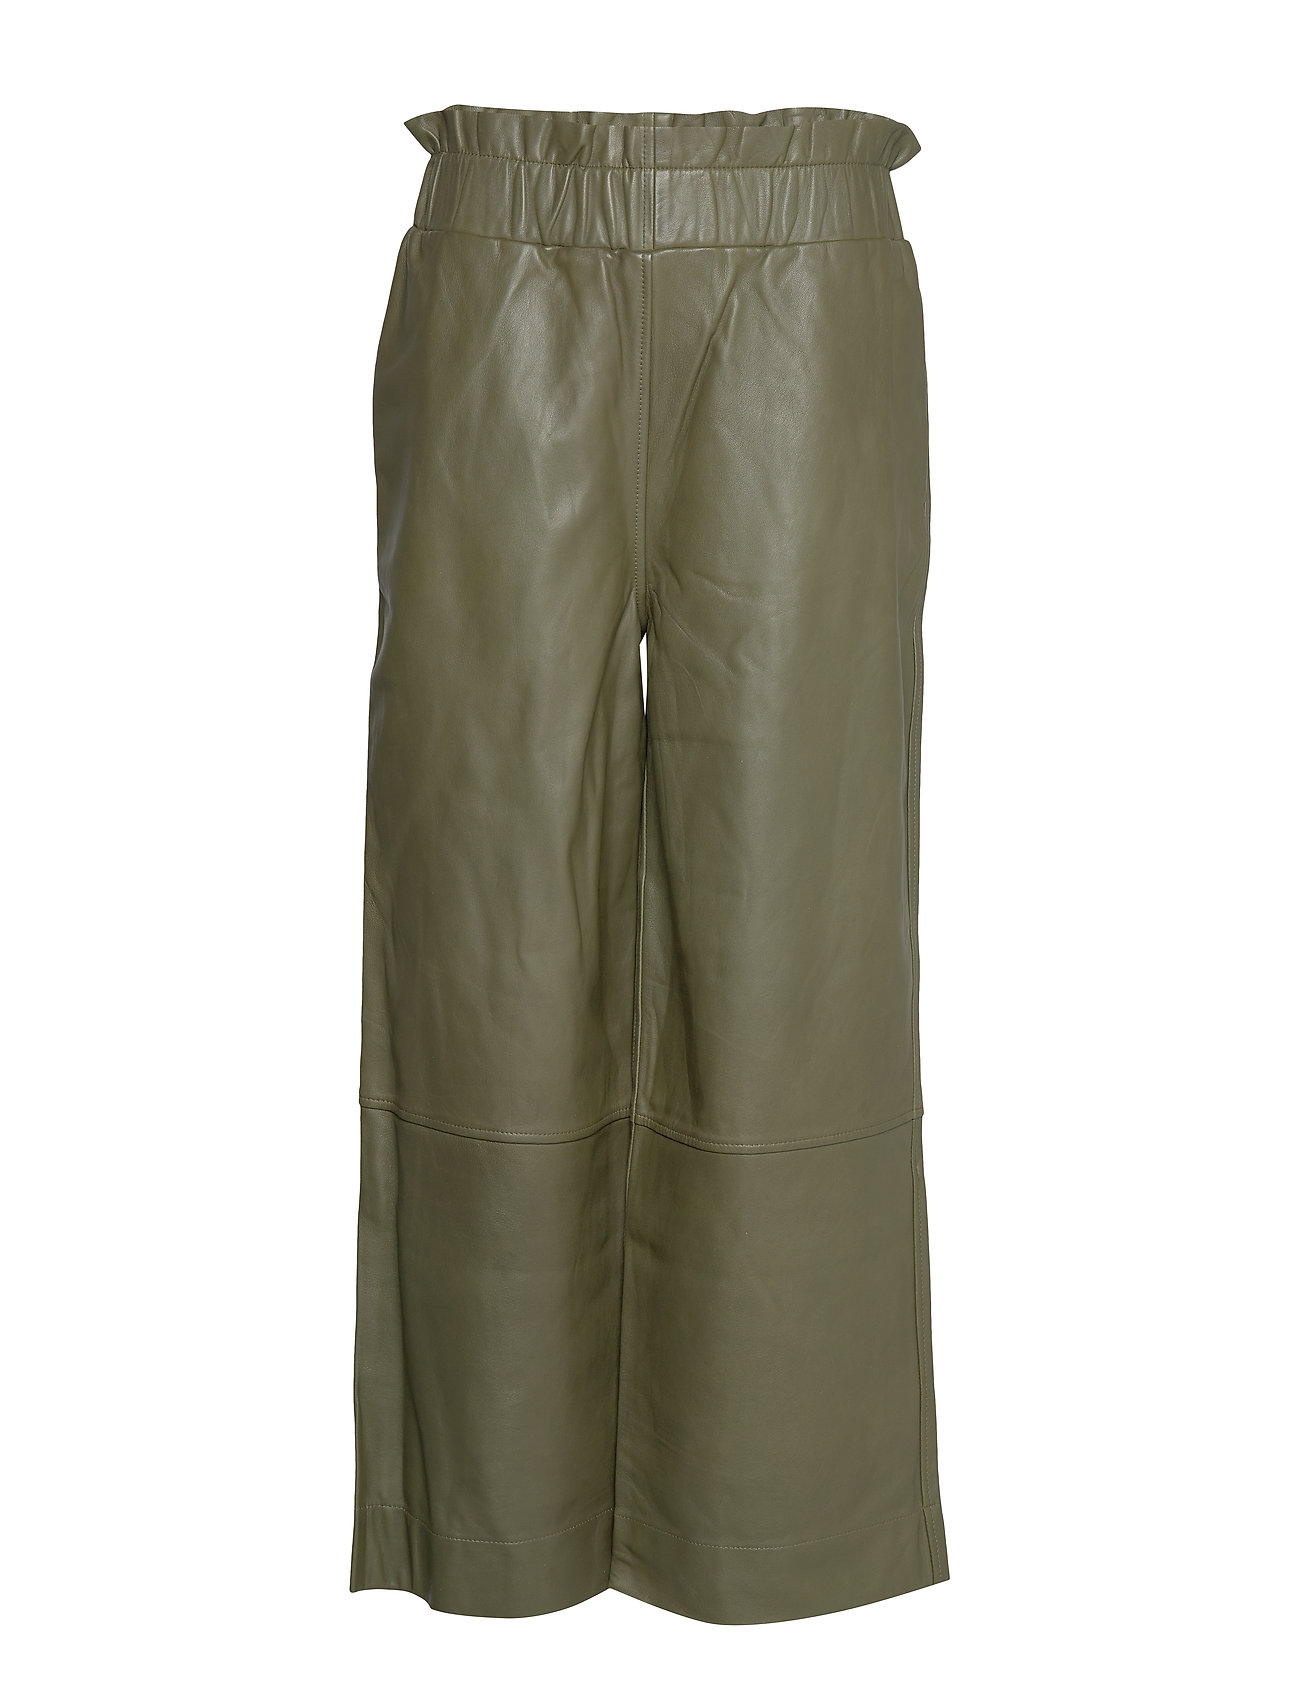 Image of Lamb Leather Pants Leather Leggings/Bukser Grøn Ganni (3291431421)